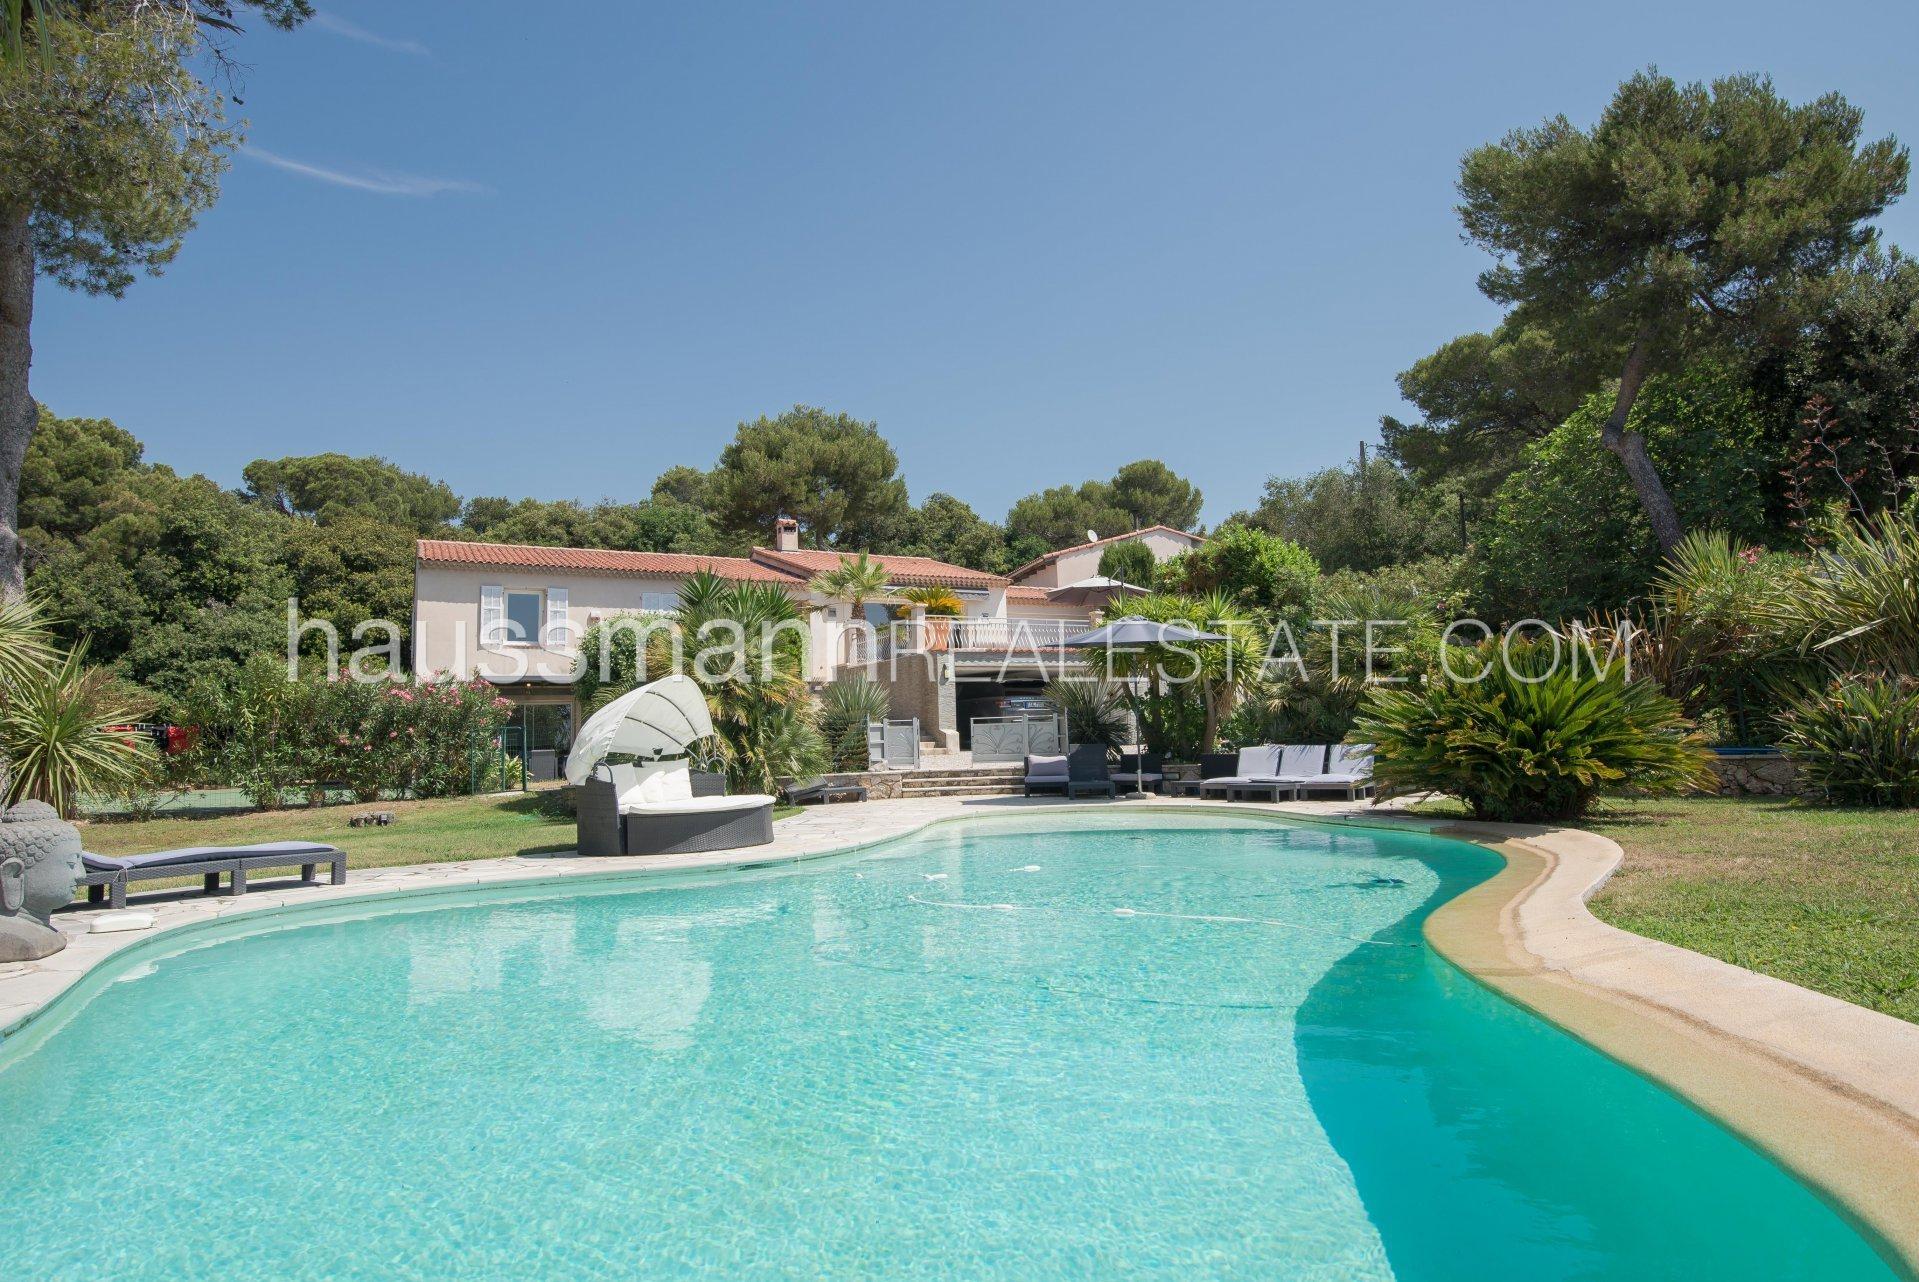 Villa in Nice, Provence-Alpes-Côte d'Azur, France 1 - 10883913